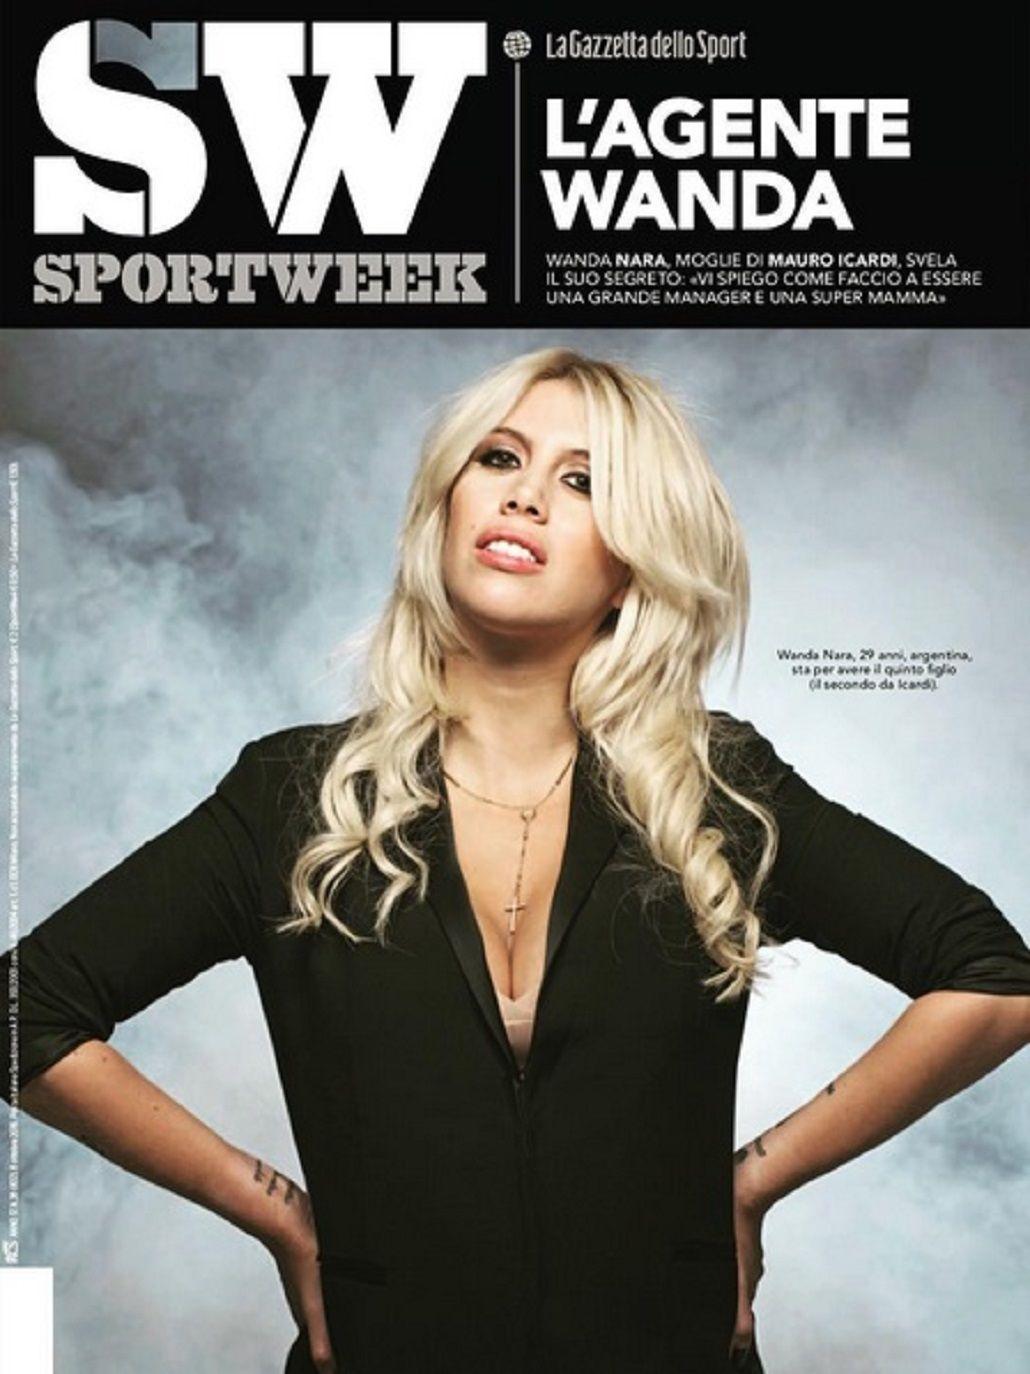 Wanda habló de su embarazo en una revista italiana